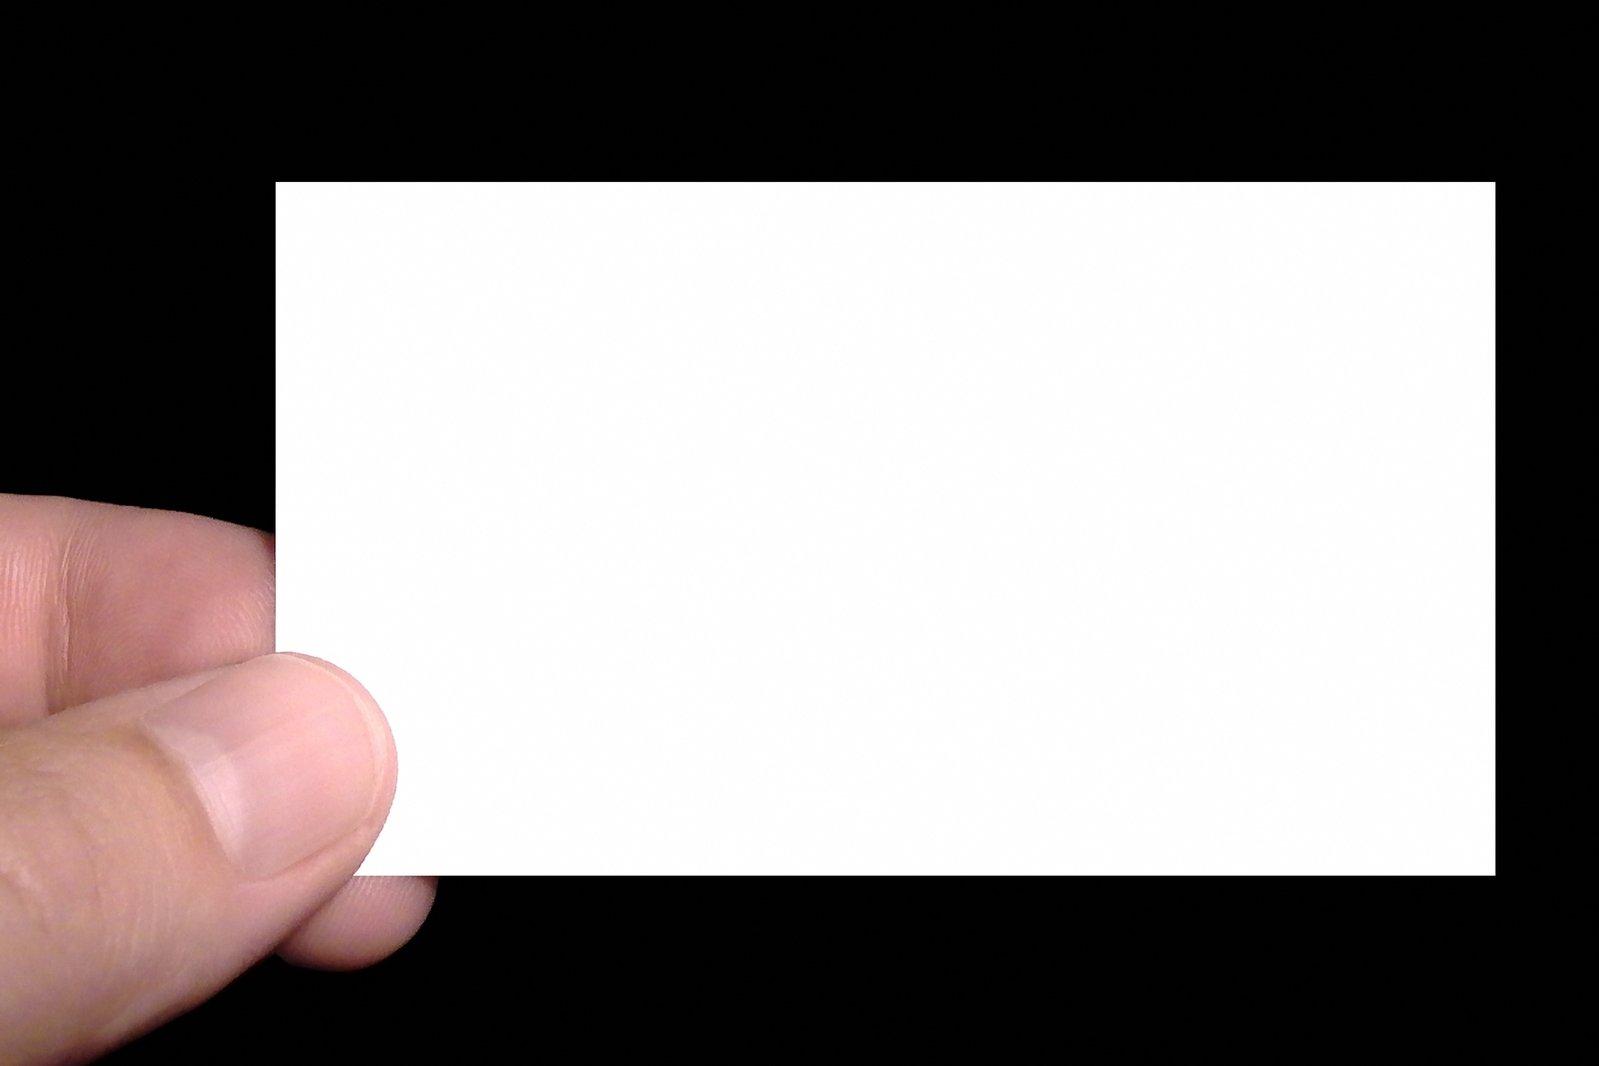 business card blank 1562061 - Photoshop İle Para Kazanma | Yüksek Kazanç Garantili !